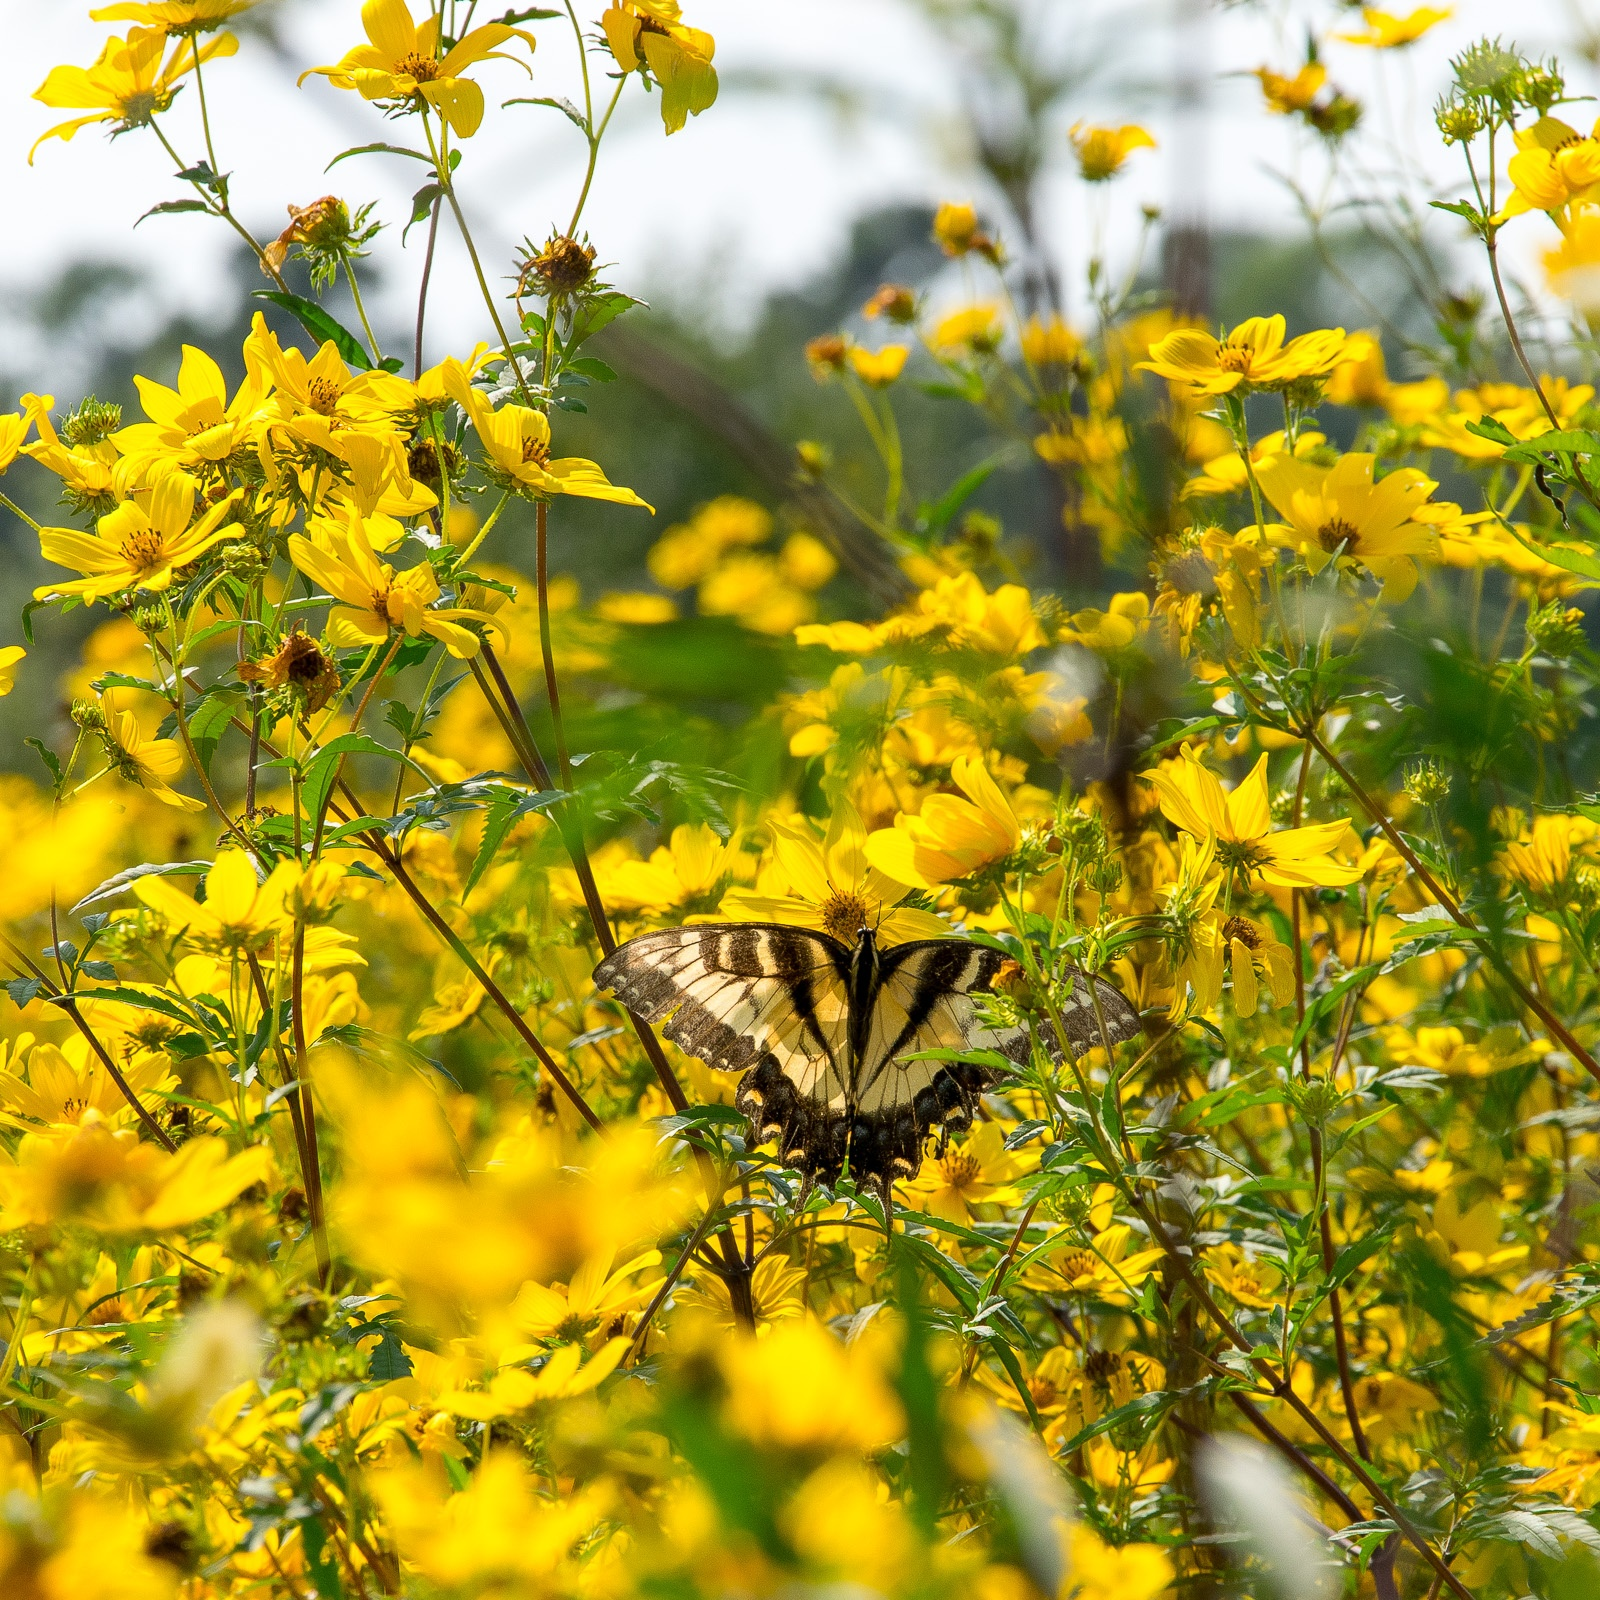 Bur Marigold pollinator